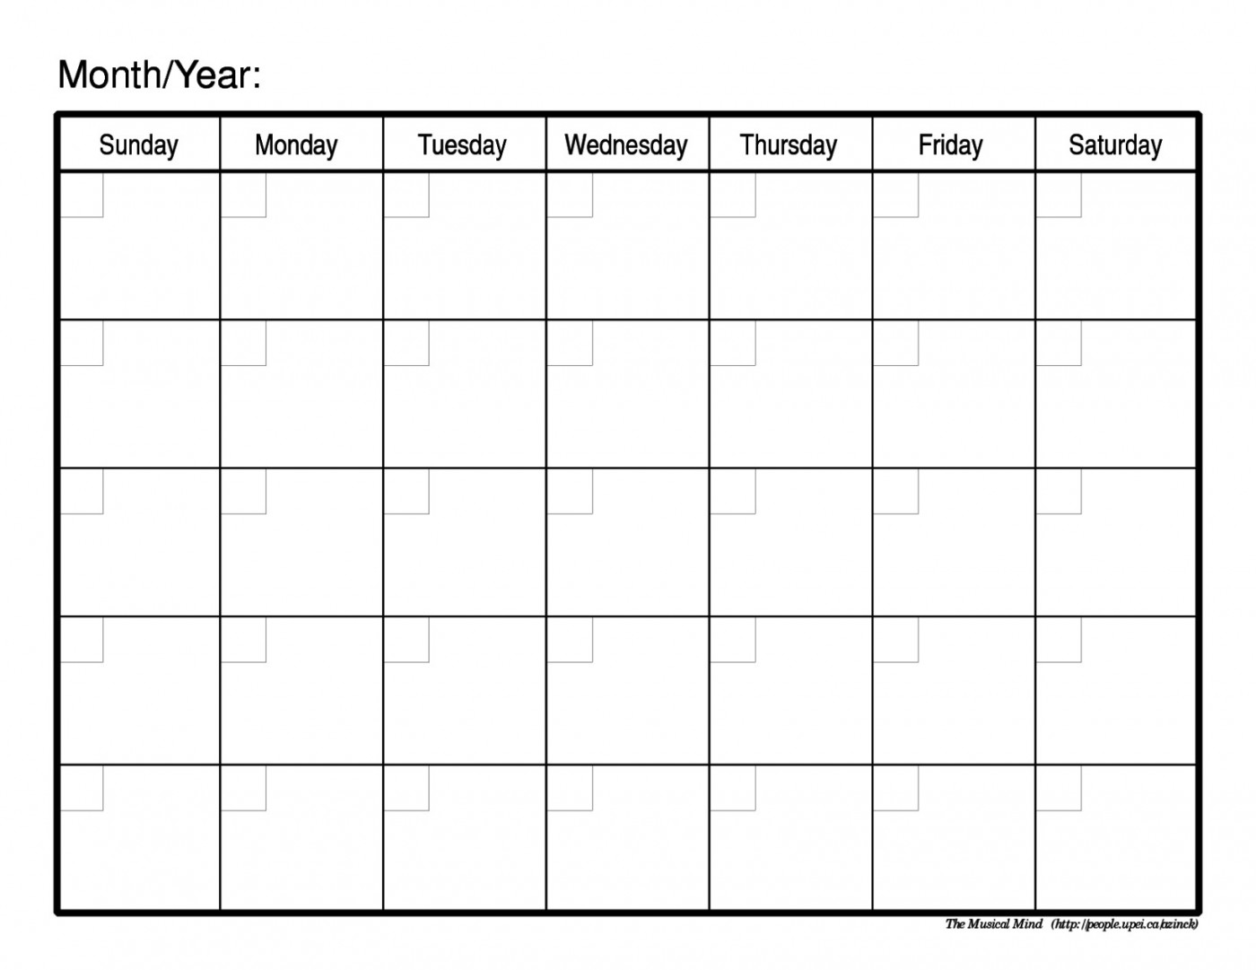 Monthly Calendar Spreadsheet For 001 Printable Monthly Calendar Templates Template ~ Ulyssesroom